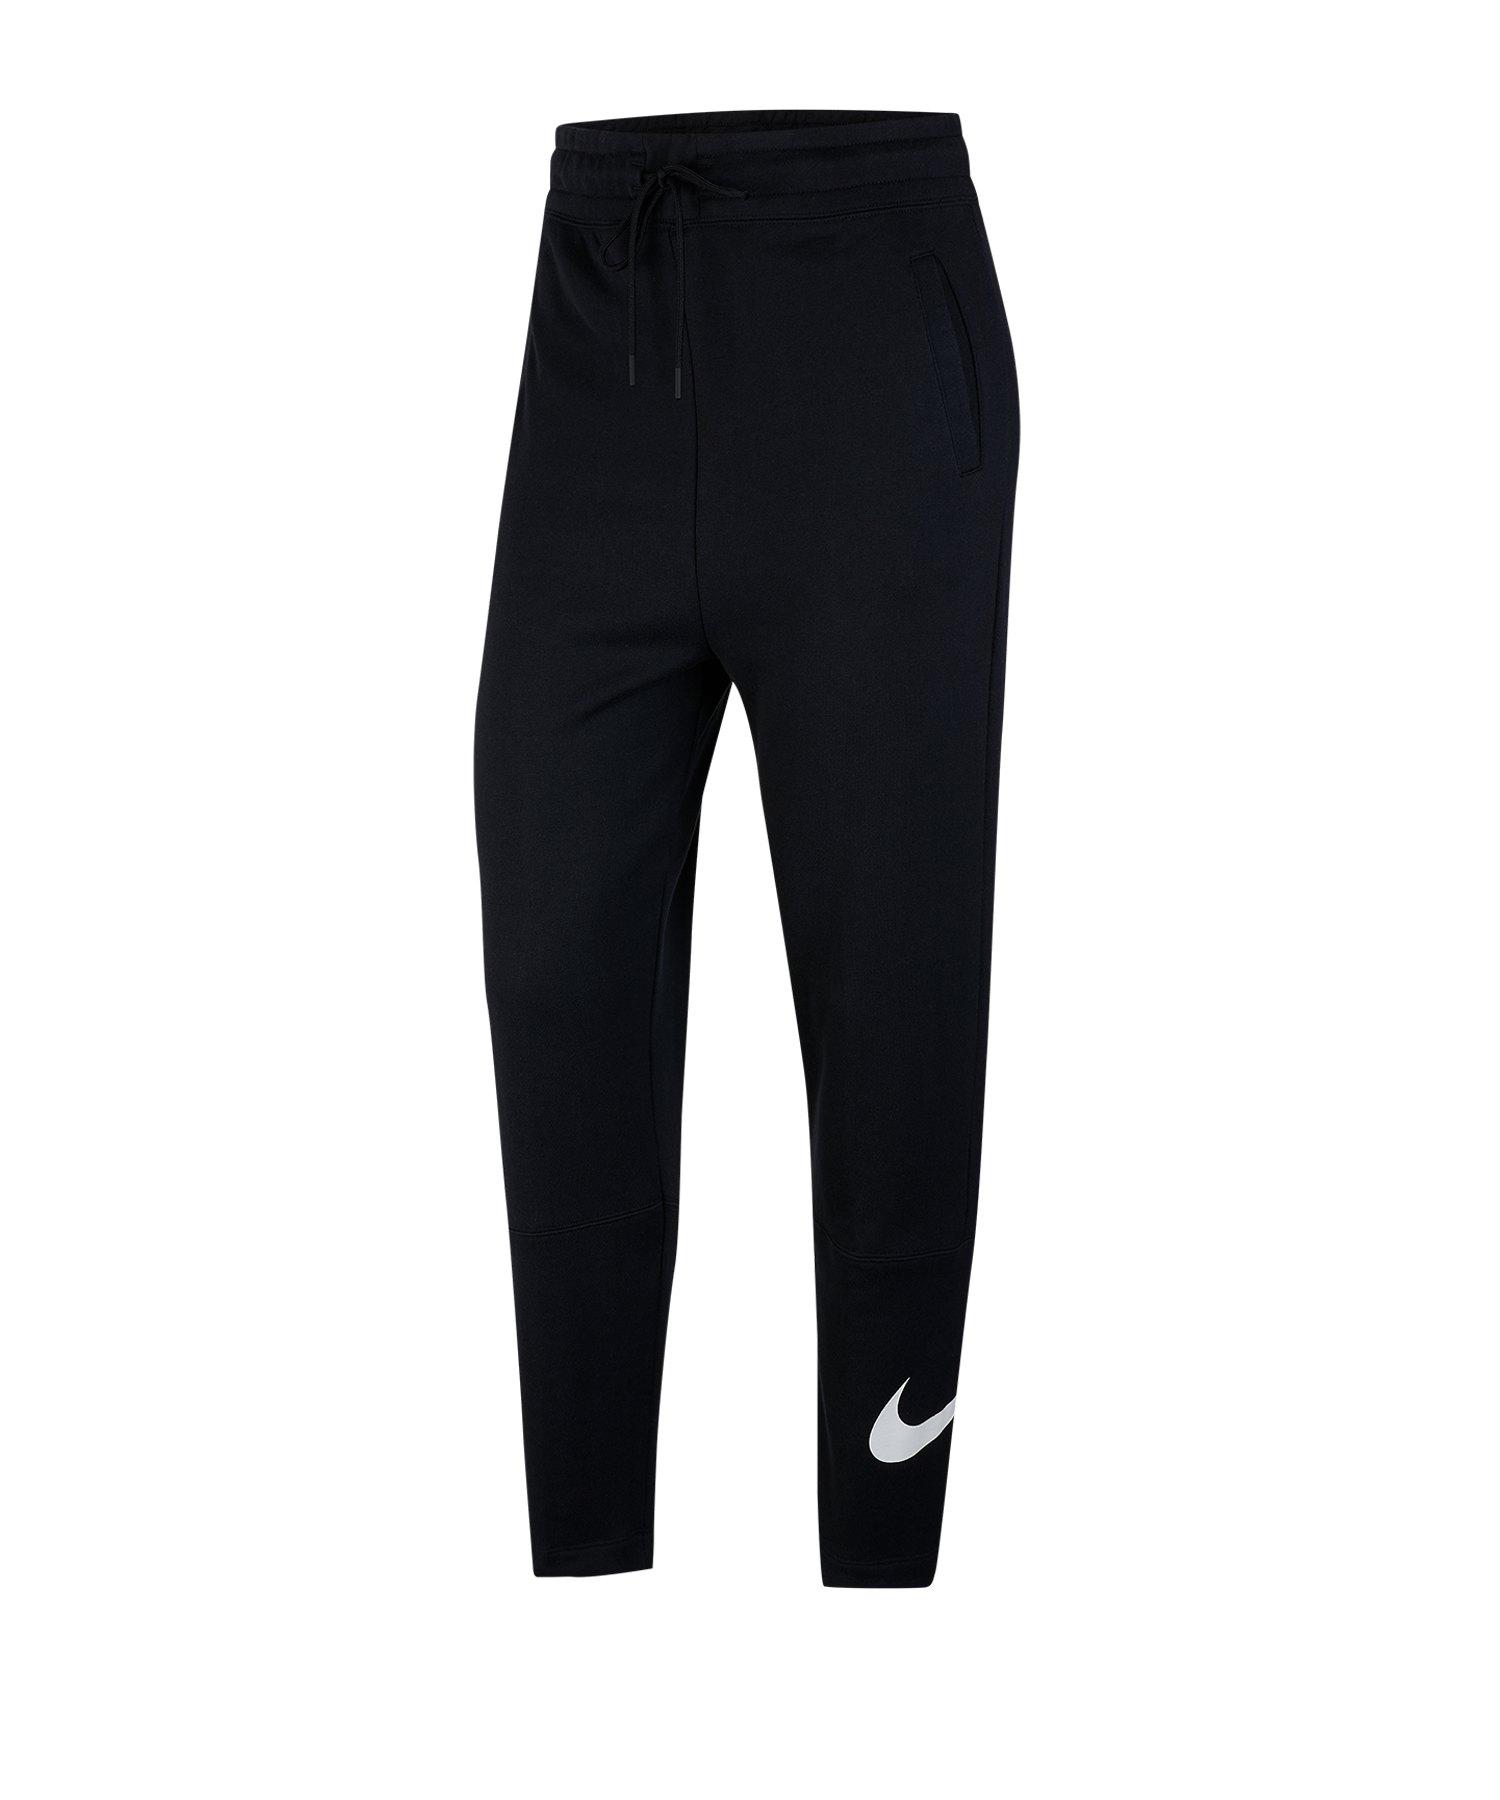 Nike Swoosh Jogginghose Damen Schwarz F010 - schwarz